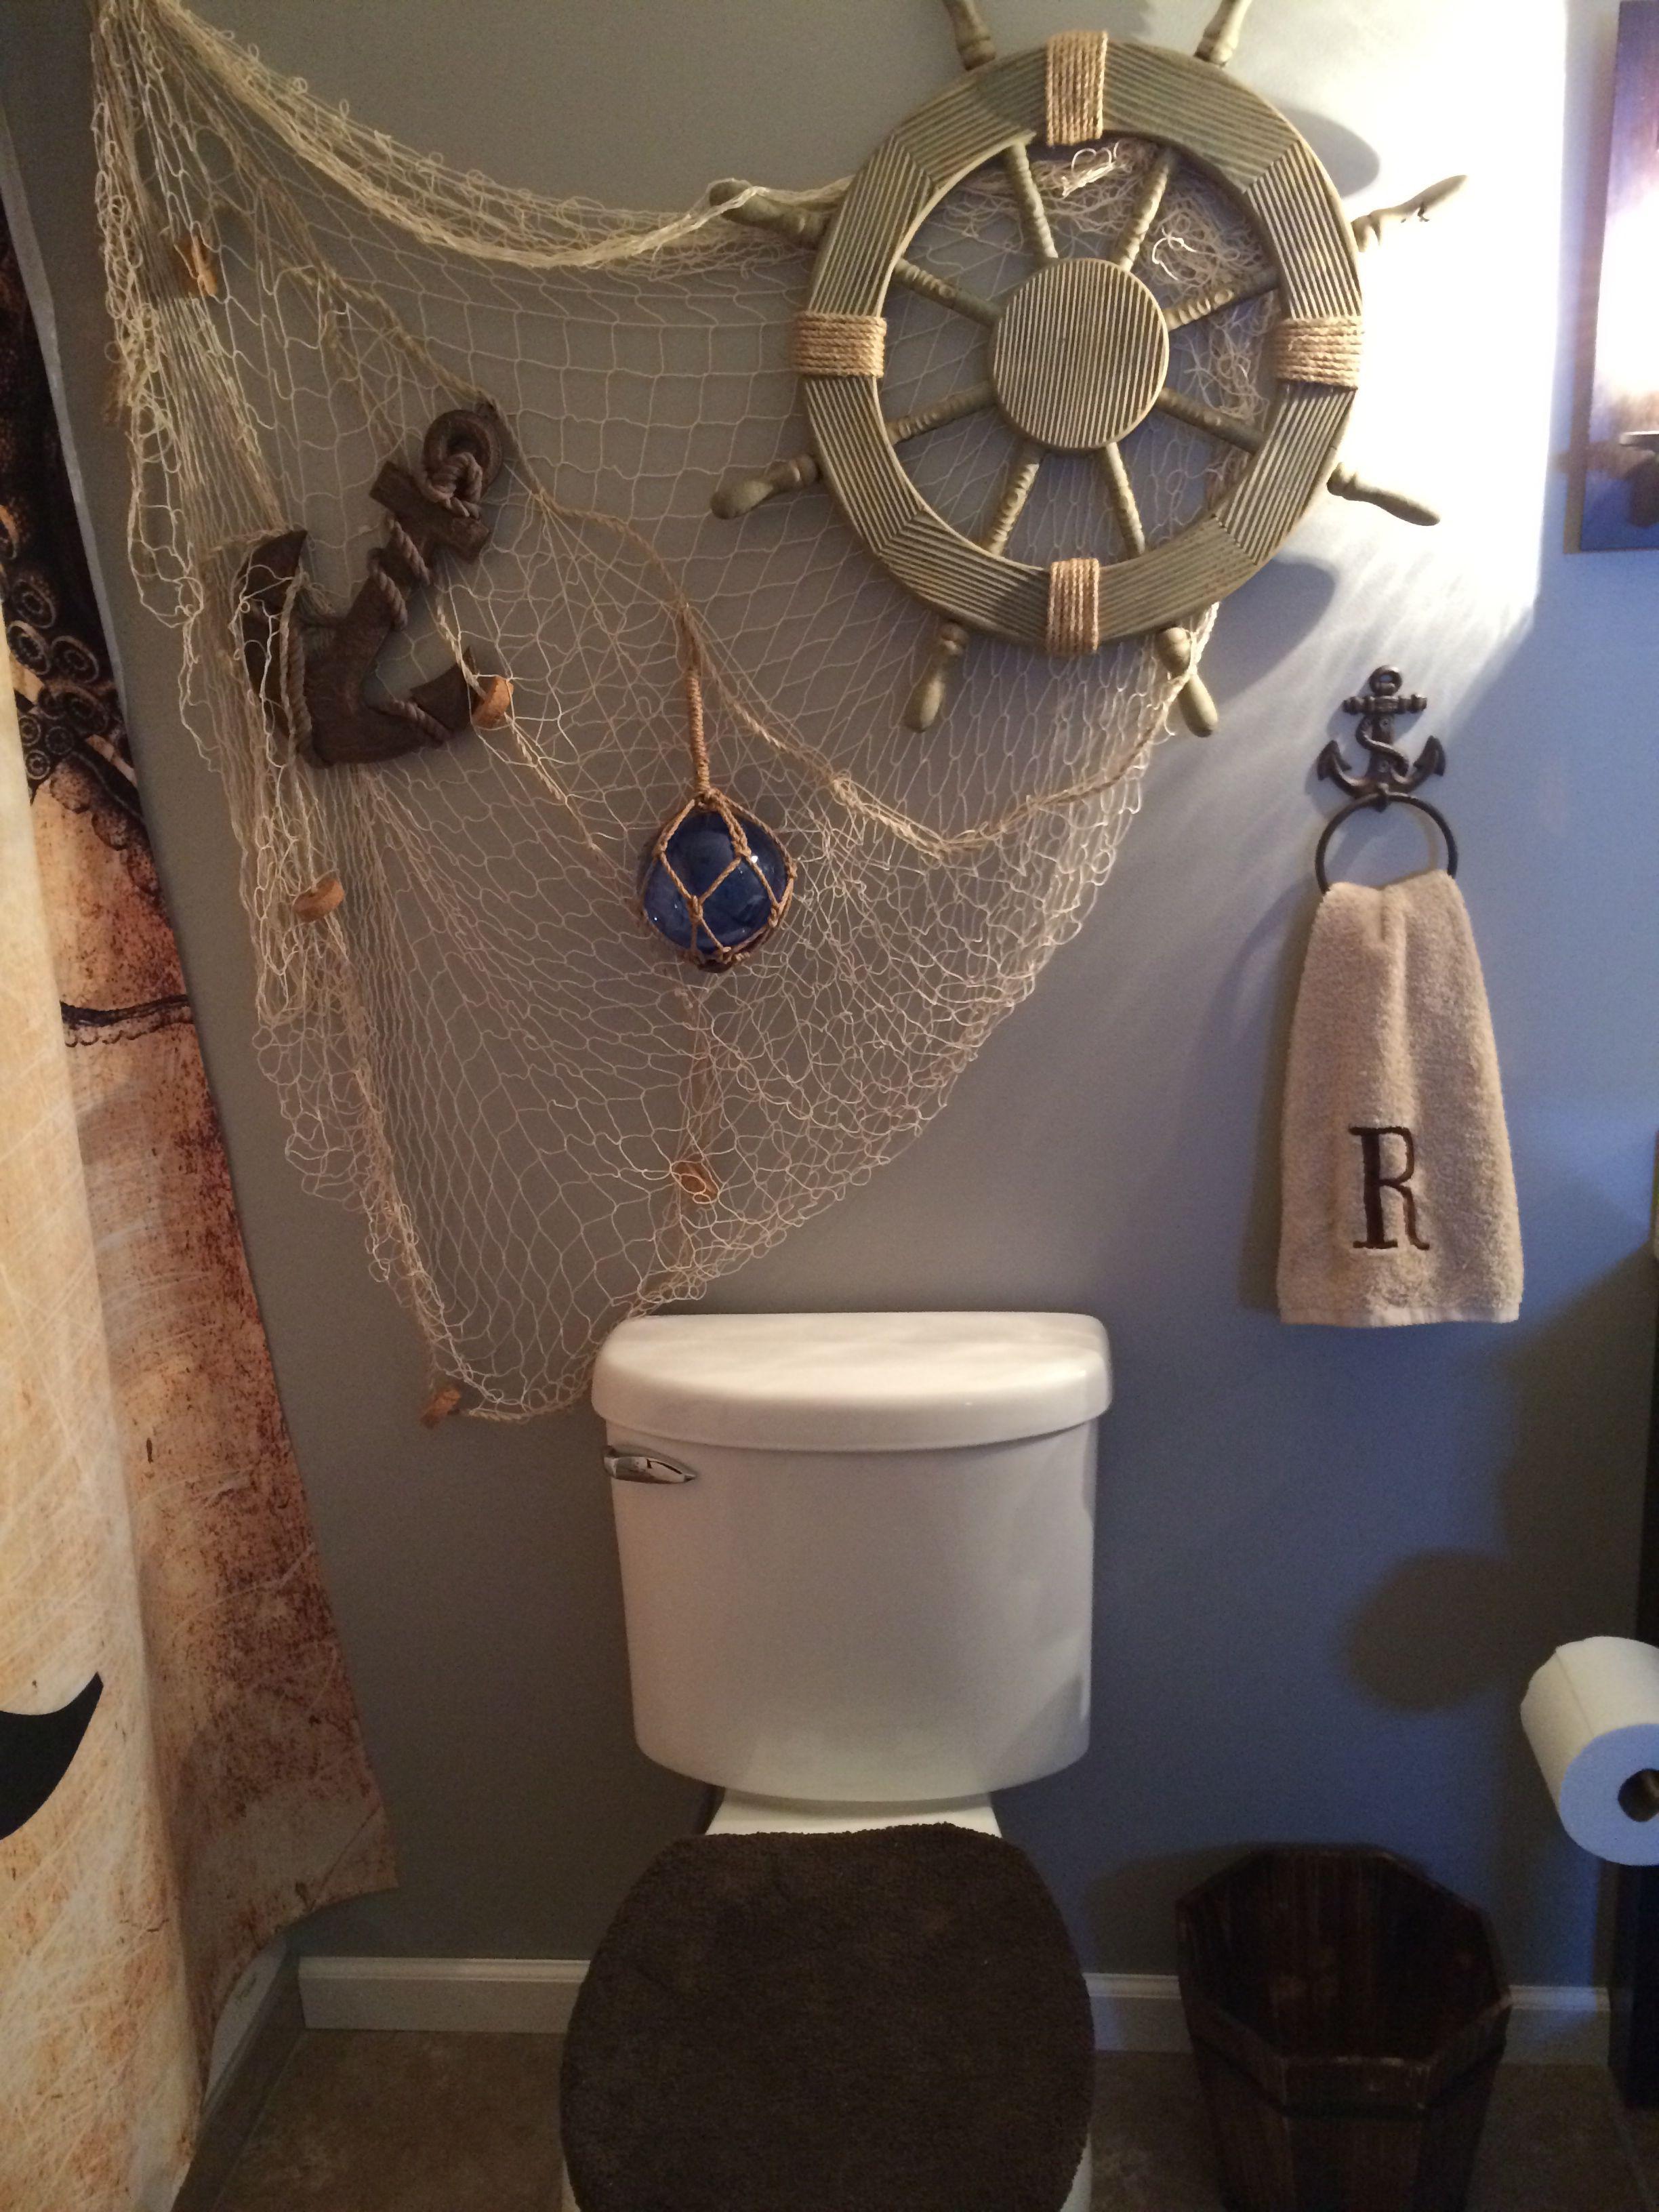 Pirate Ship Bathroom Decor In 2020 Beach Bathroom Decor Beach Theme Bathroom Bathroom Design Decor